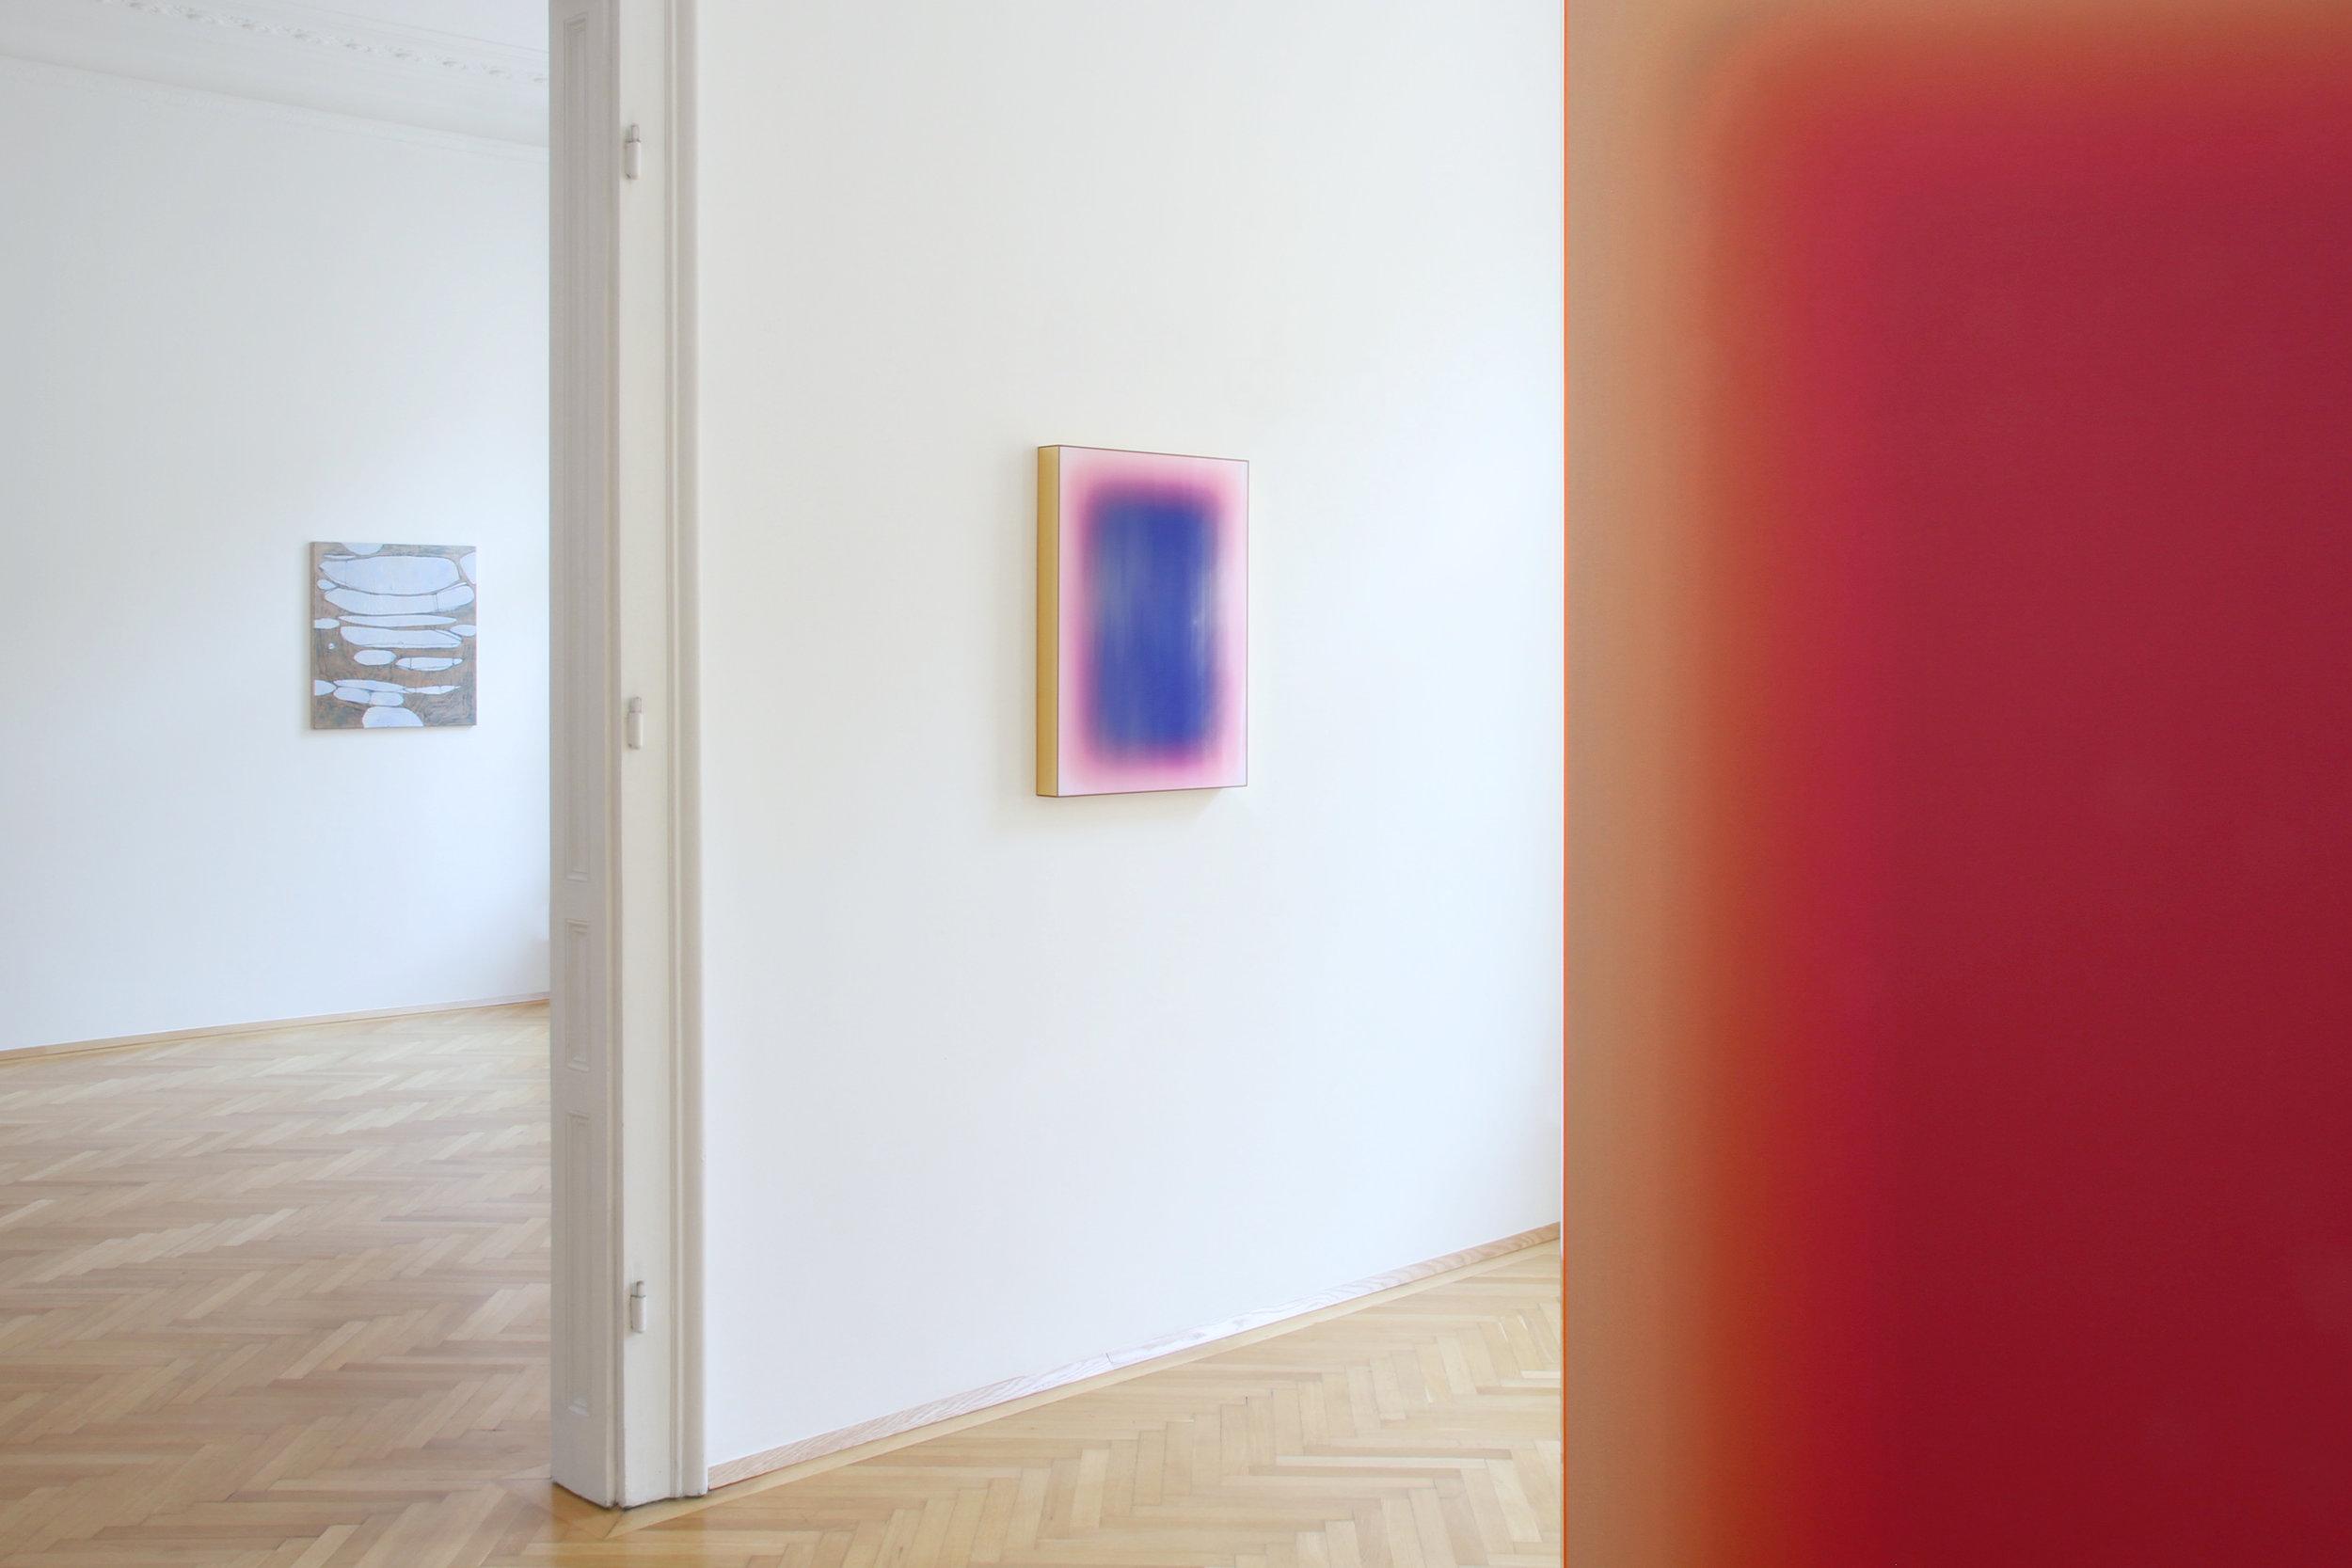 Splitting Image, Jonny Niesche